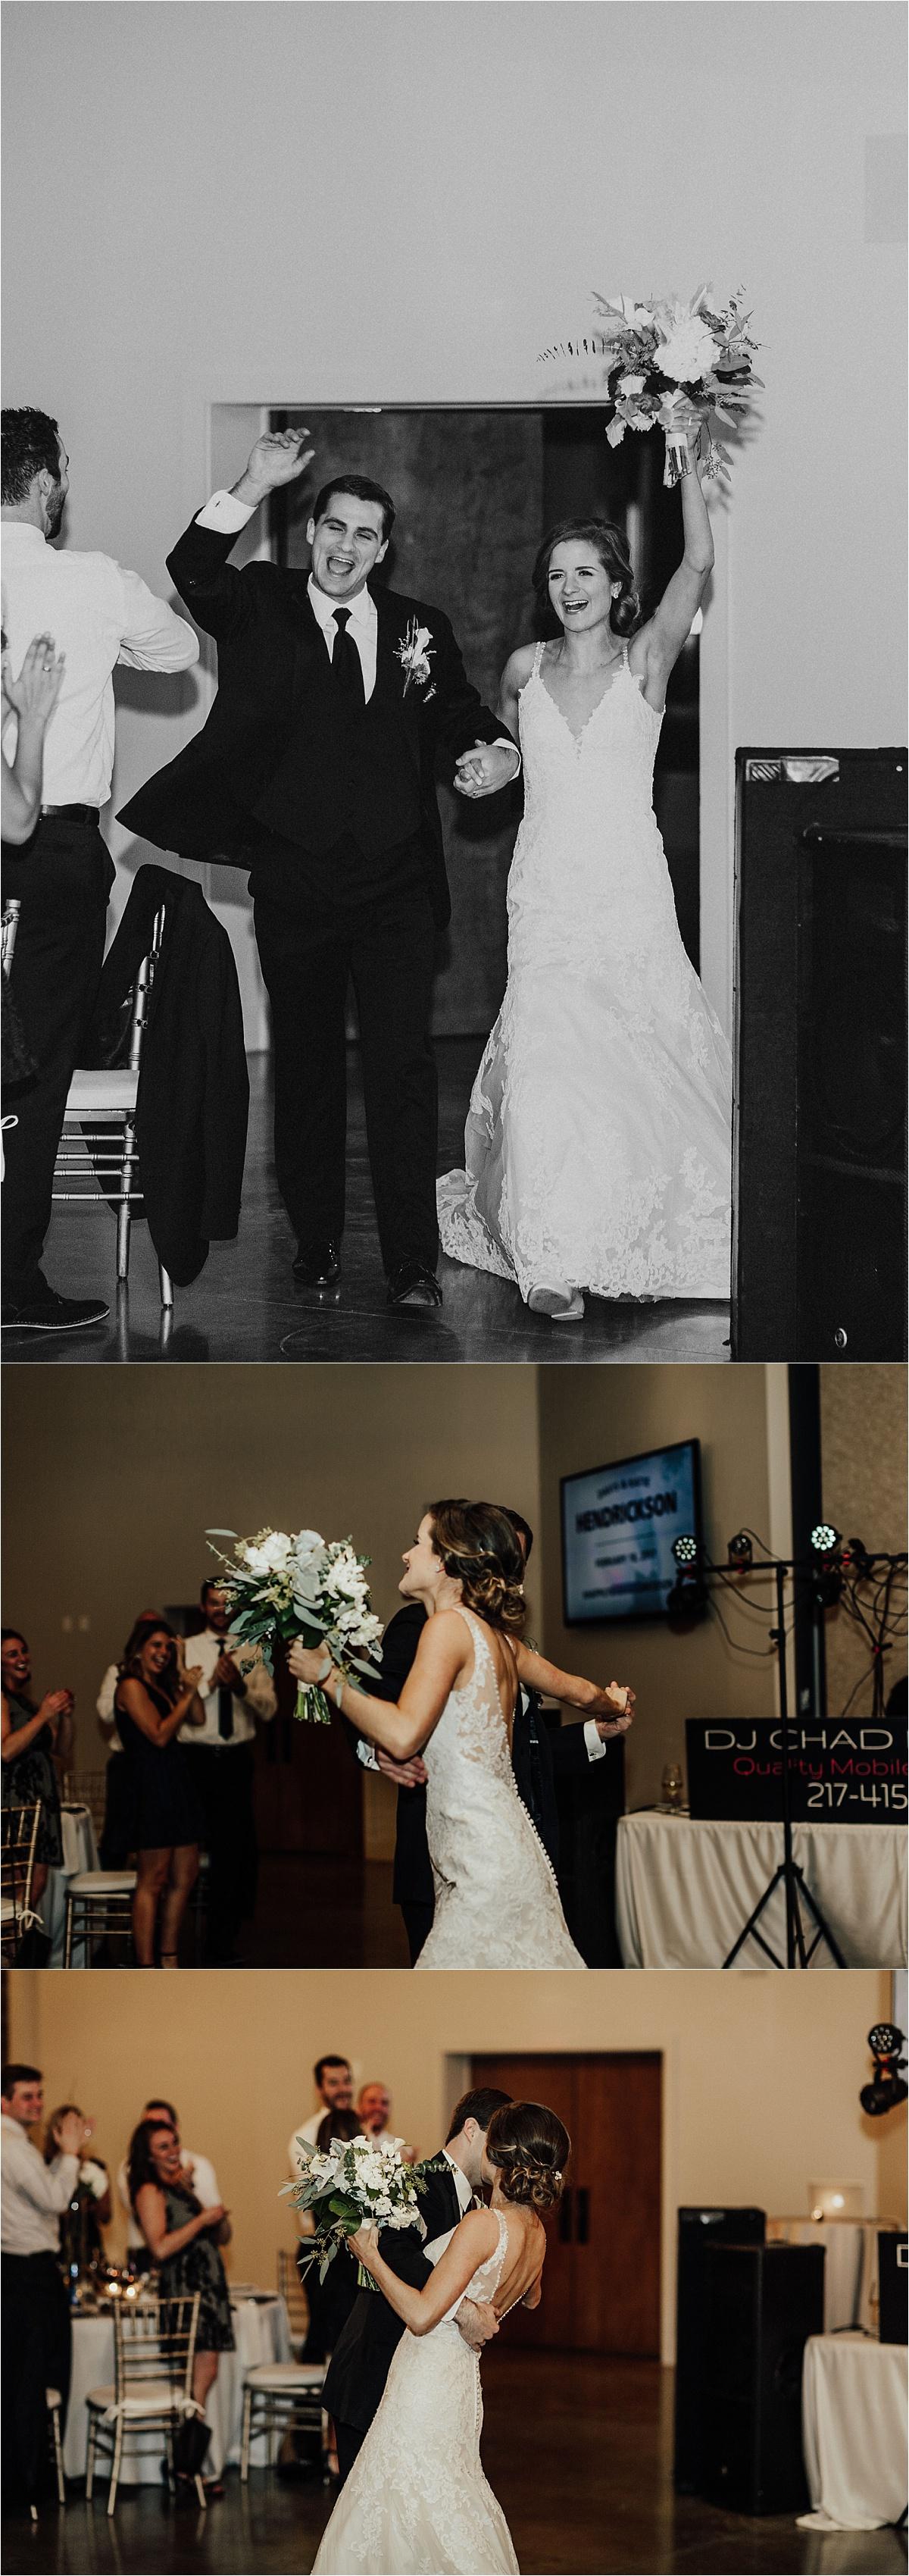 Champaign Illinois Wedding_0118.jpg